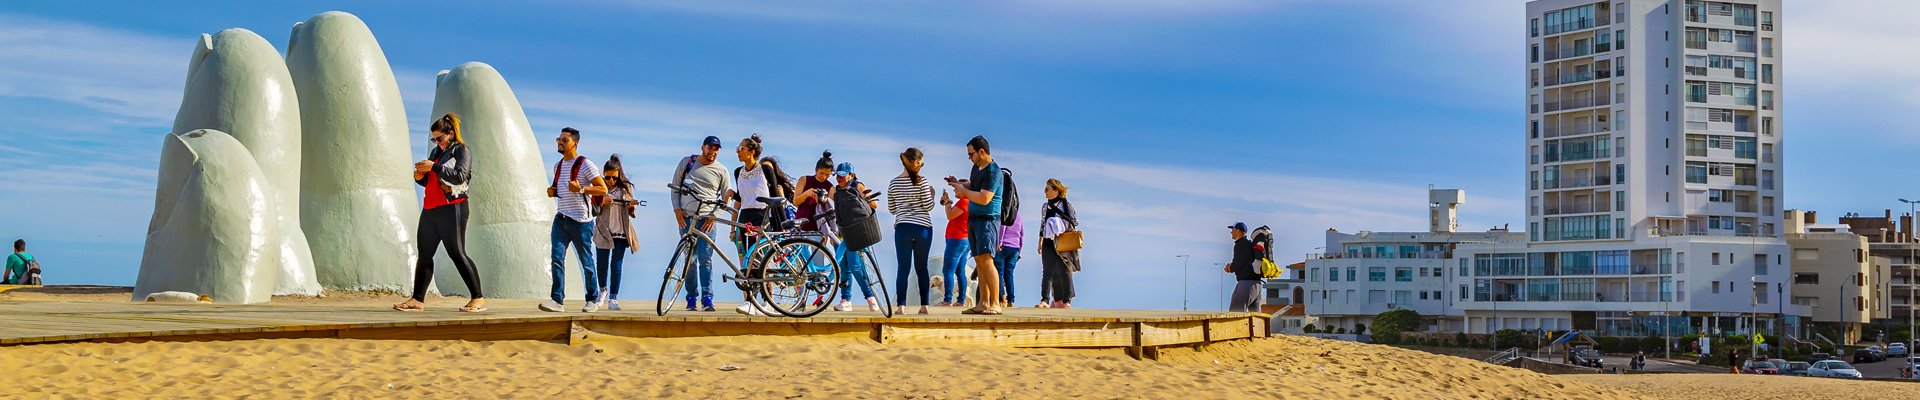 La Brava Beach in Punta del Este, Uruguay